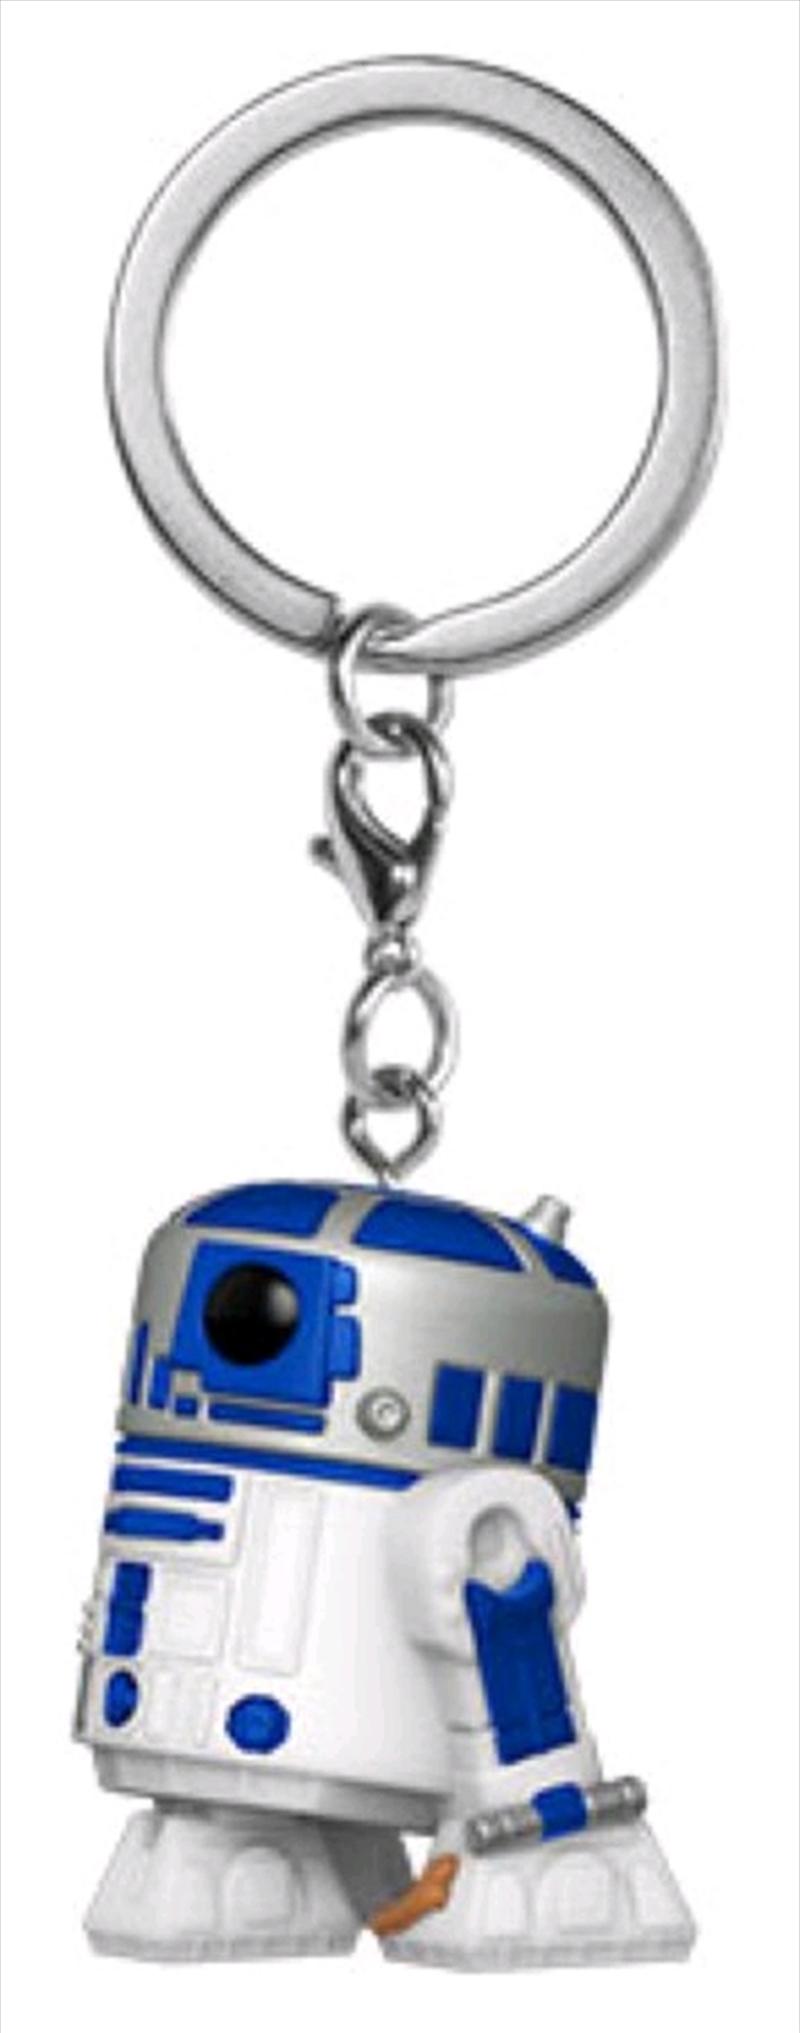 Star Wars - R2-D2 Pocket Pop! Keychain | Pop Vinyl